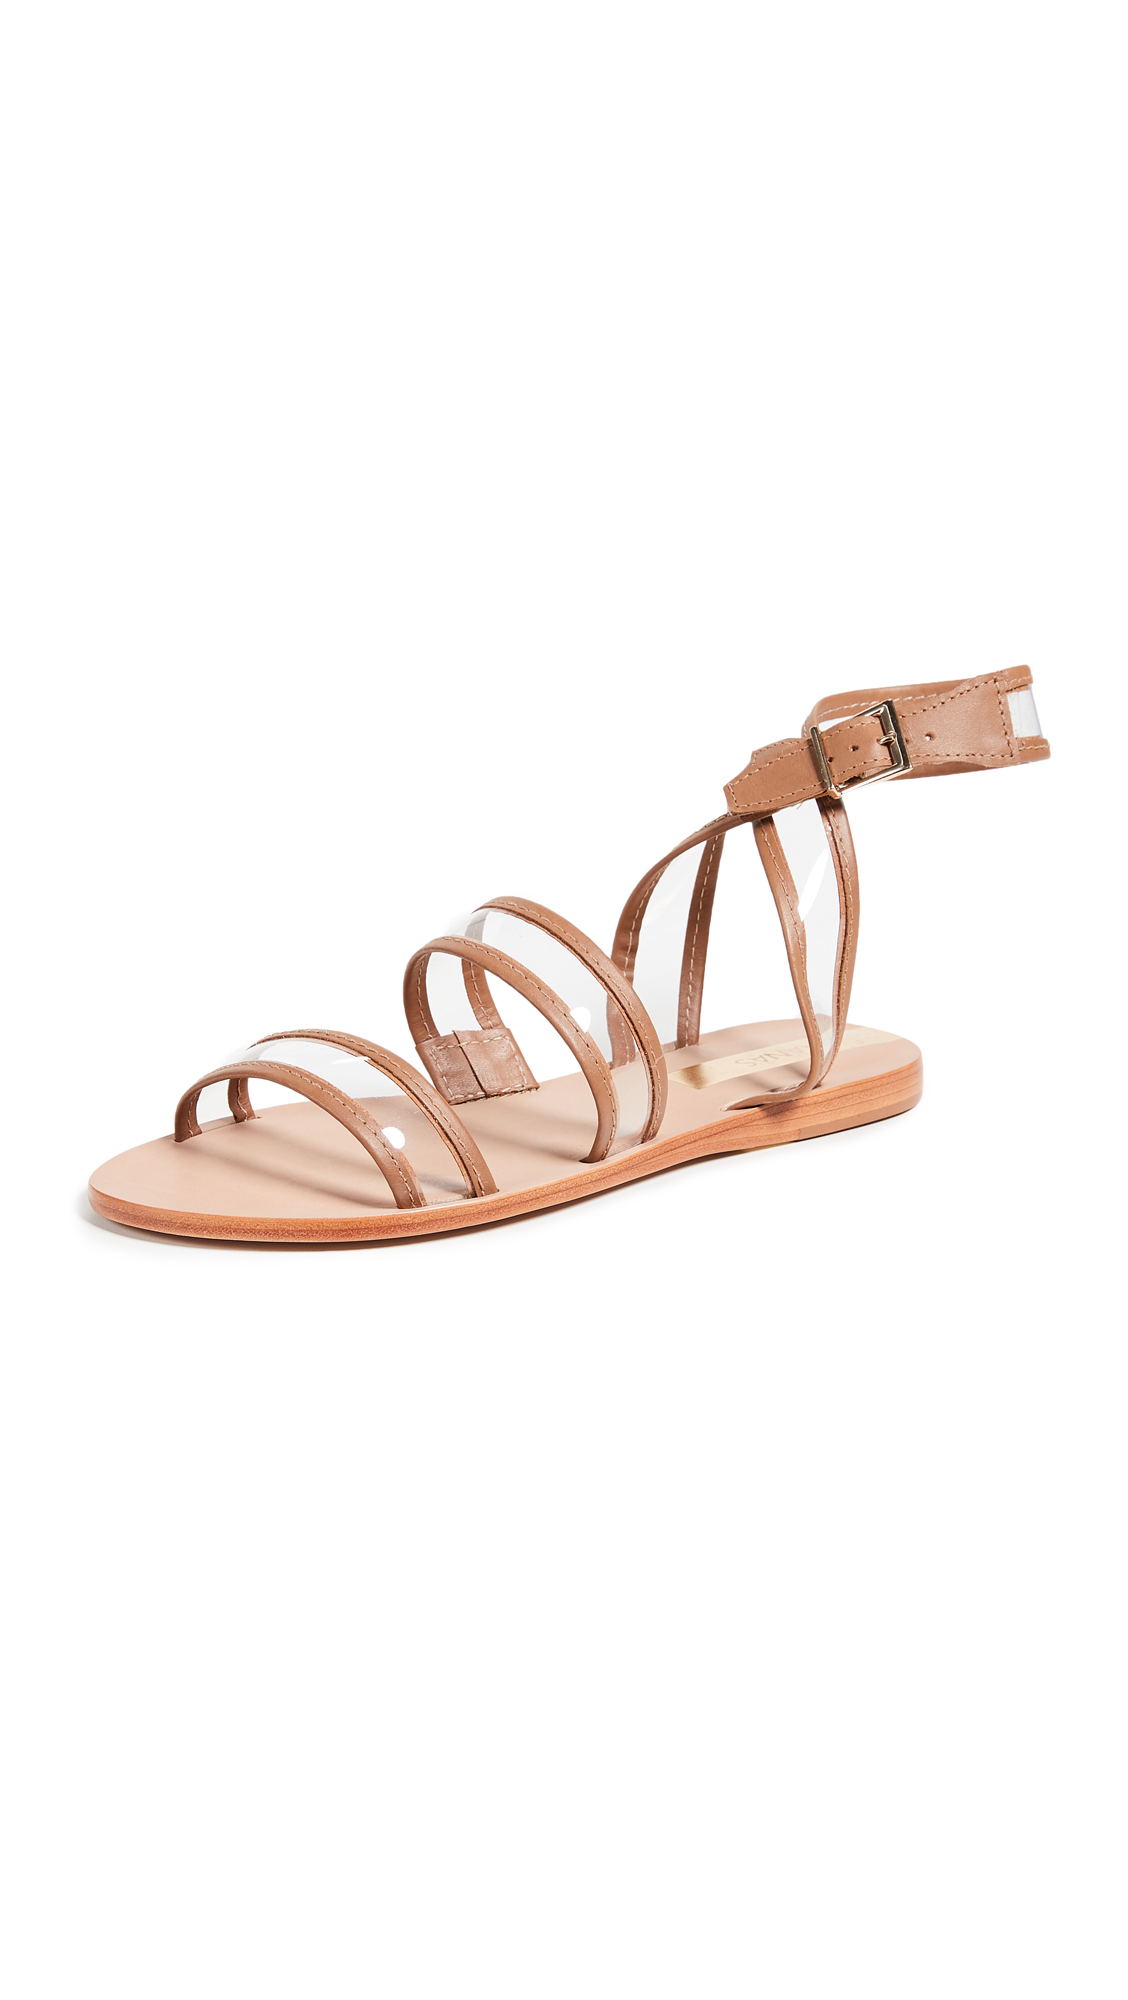 KAANAS Olinda See-Through Sandals - Honey